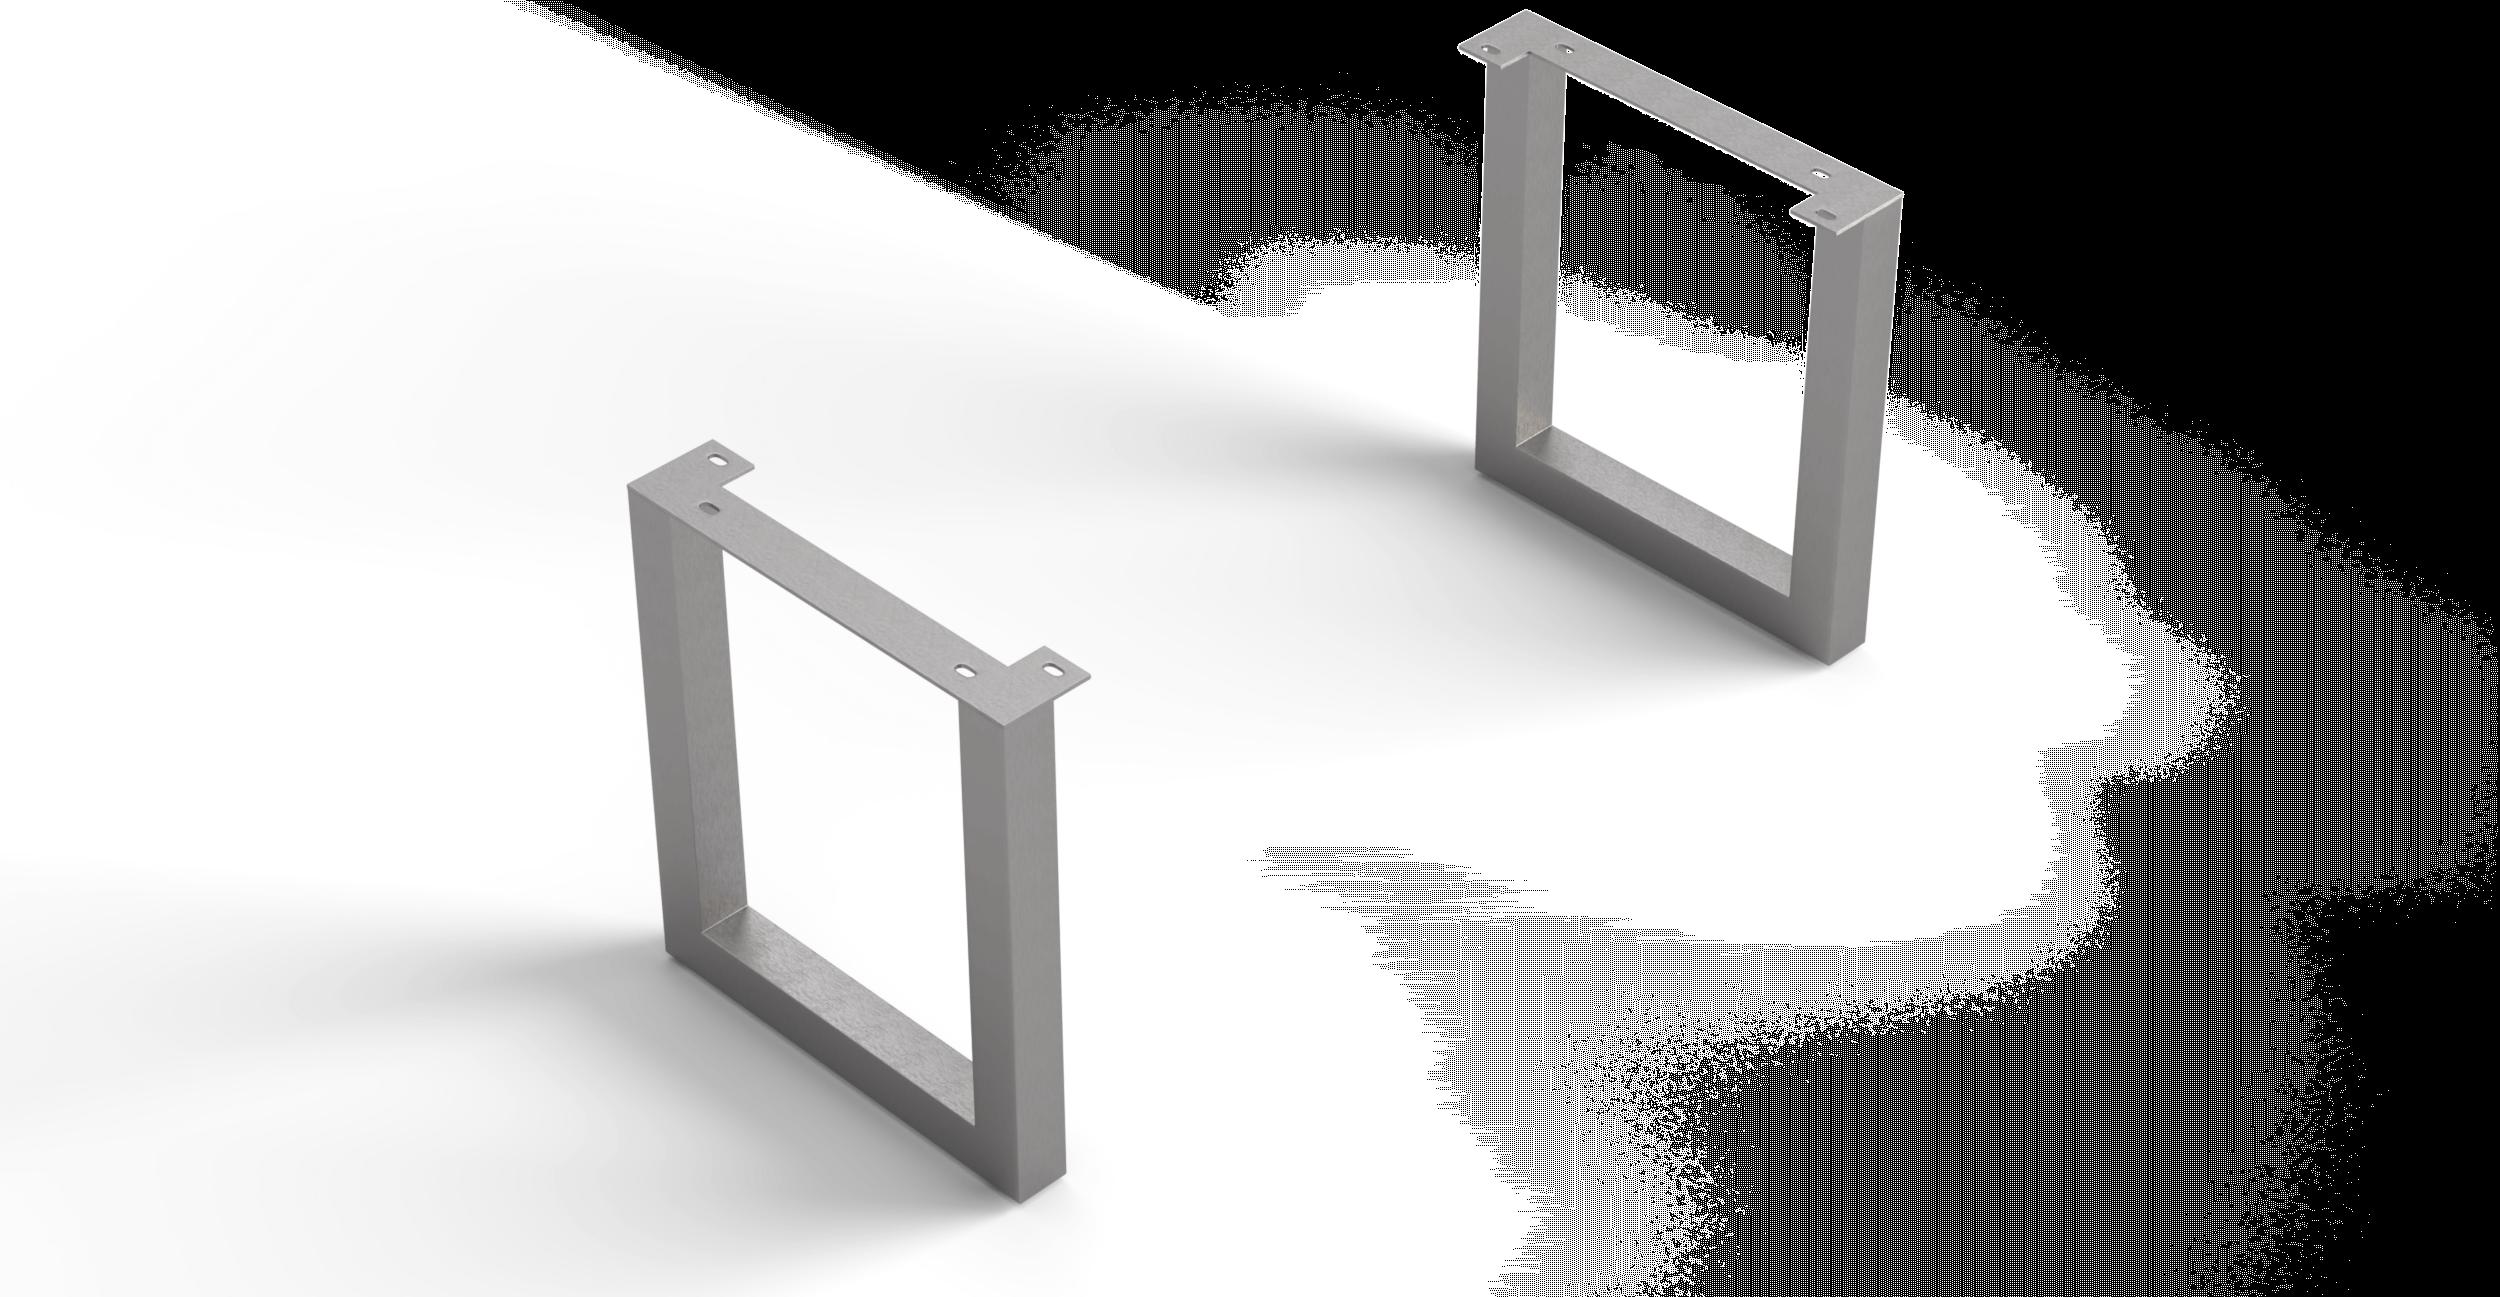 Esstische-Fuss Edge Serie 200cm Breit